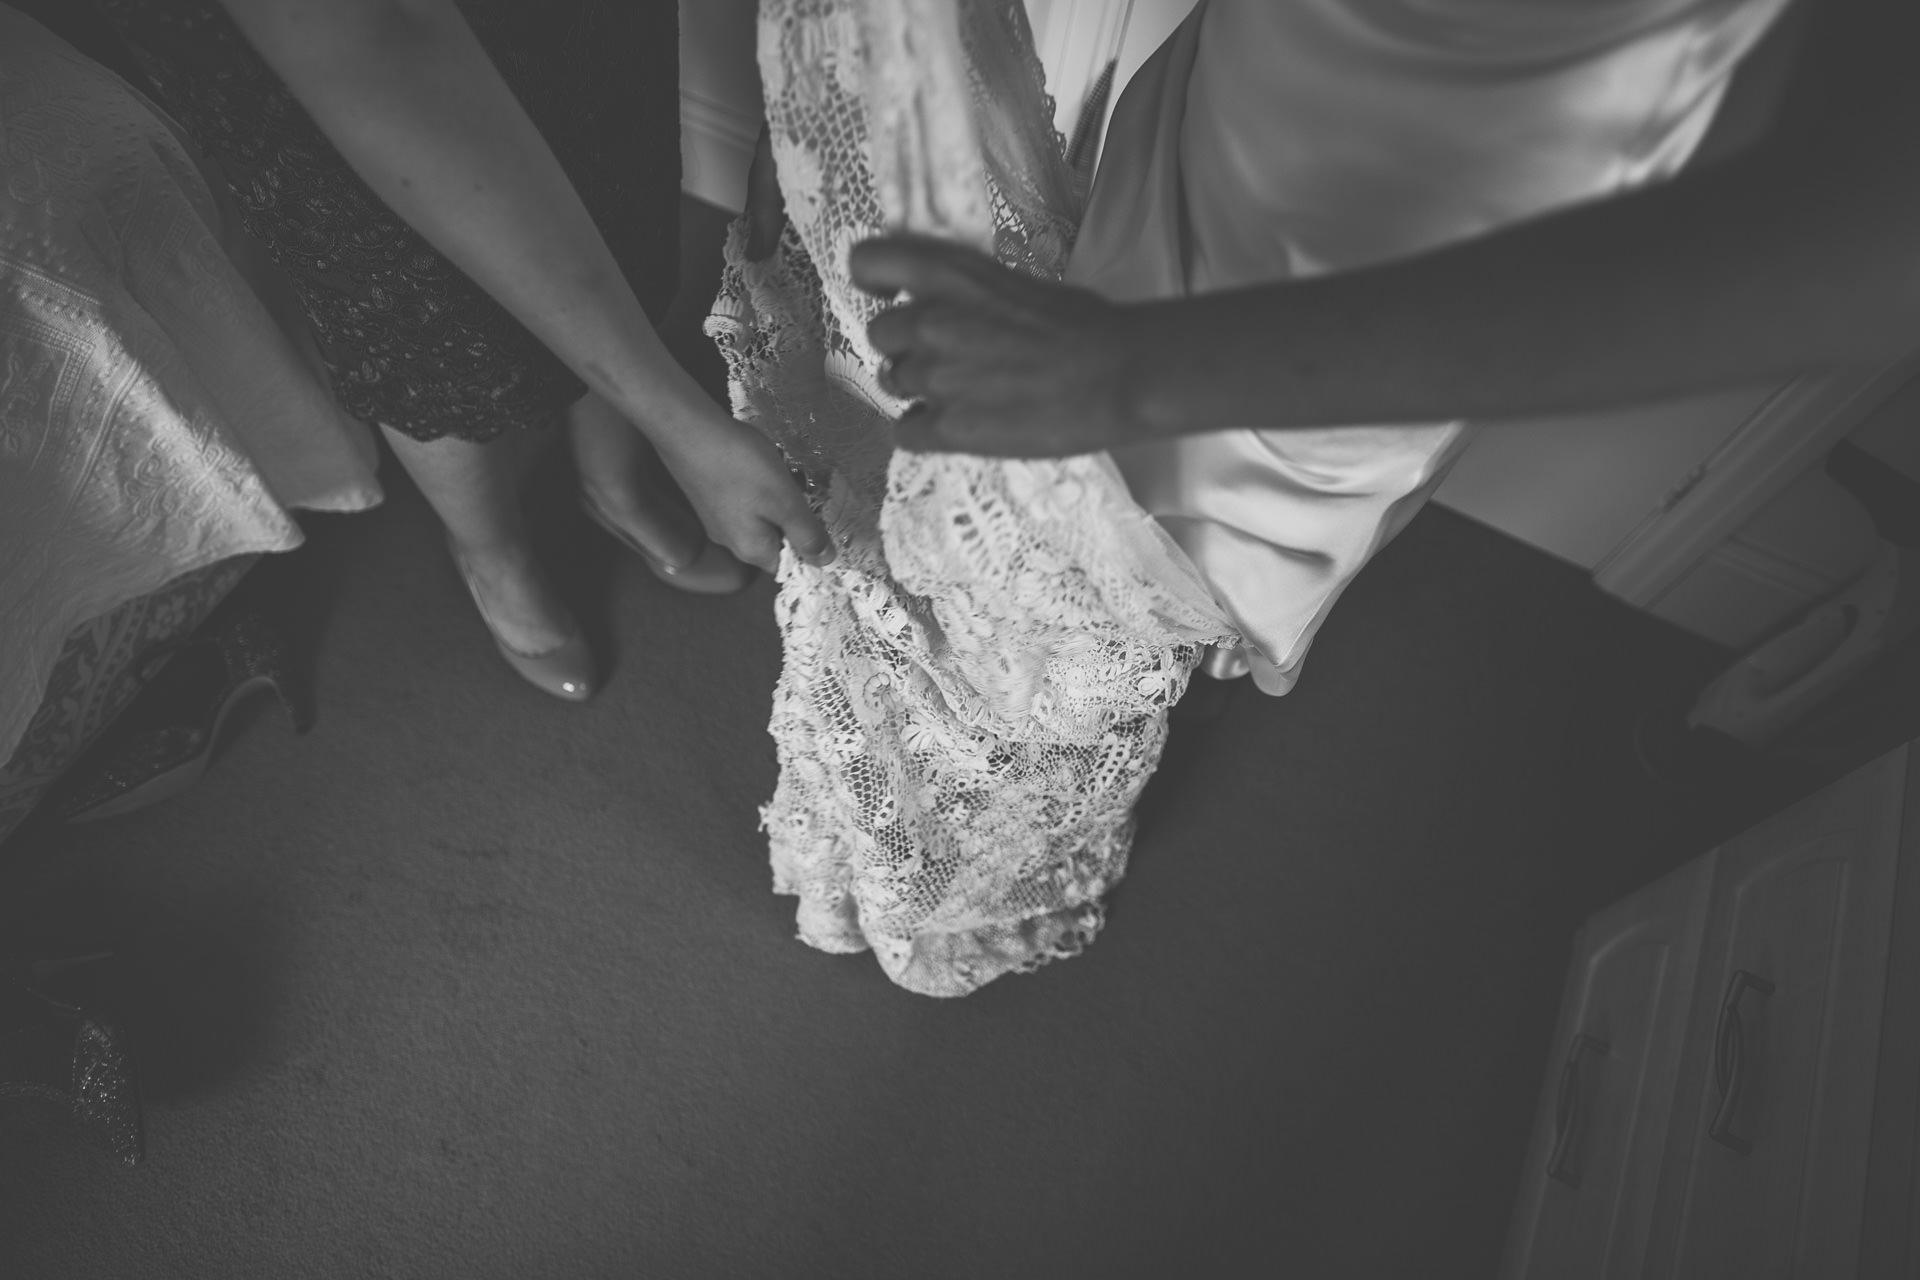 winterbourne-medieval-barn-wedding-photography-emma-andrew-39